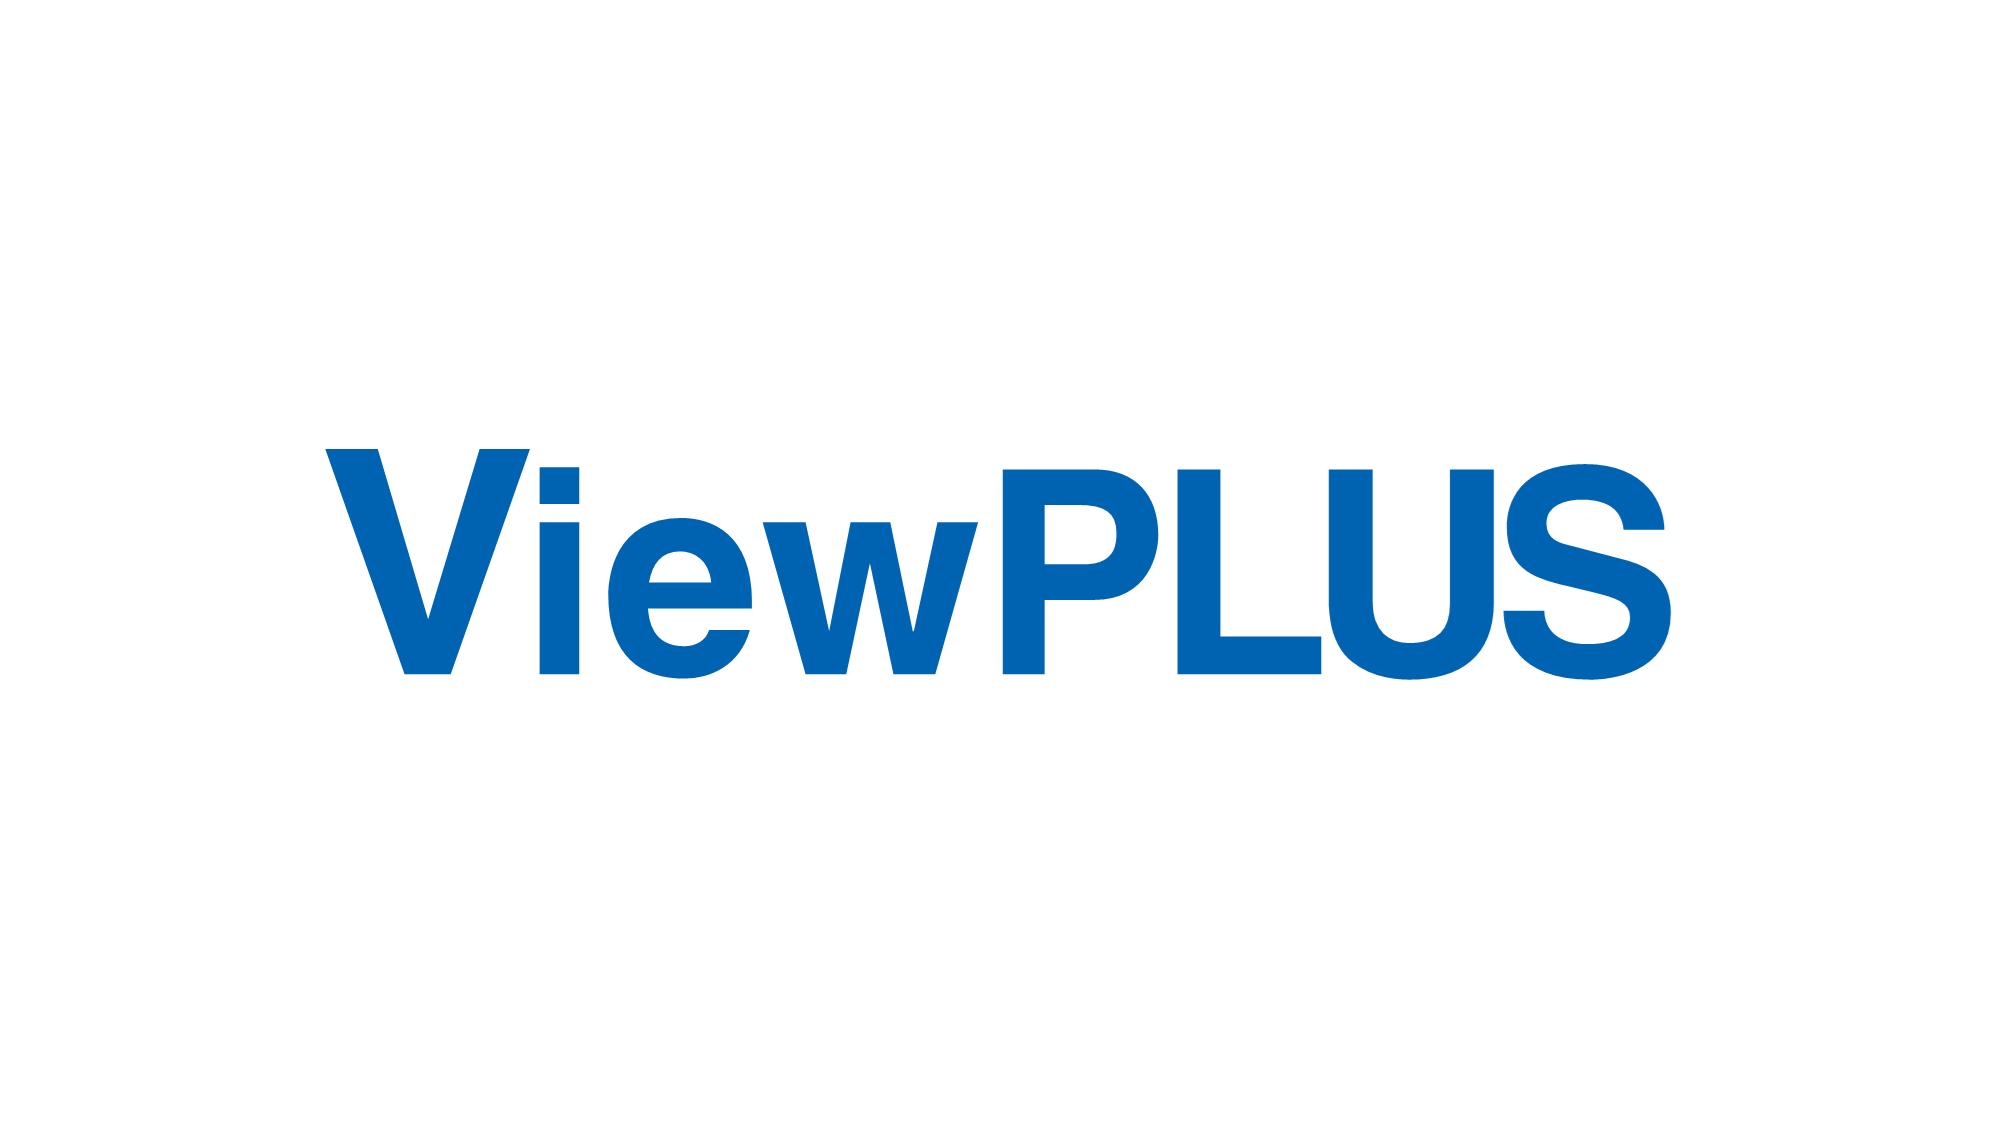 viewplus.png